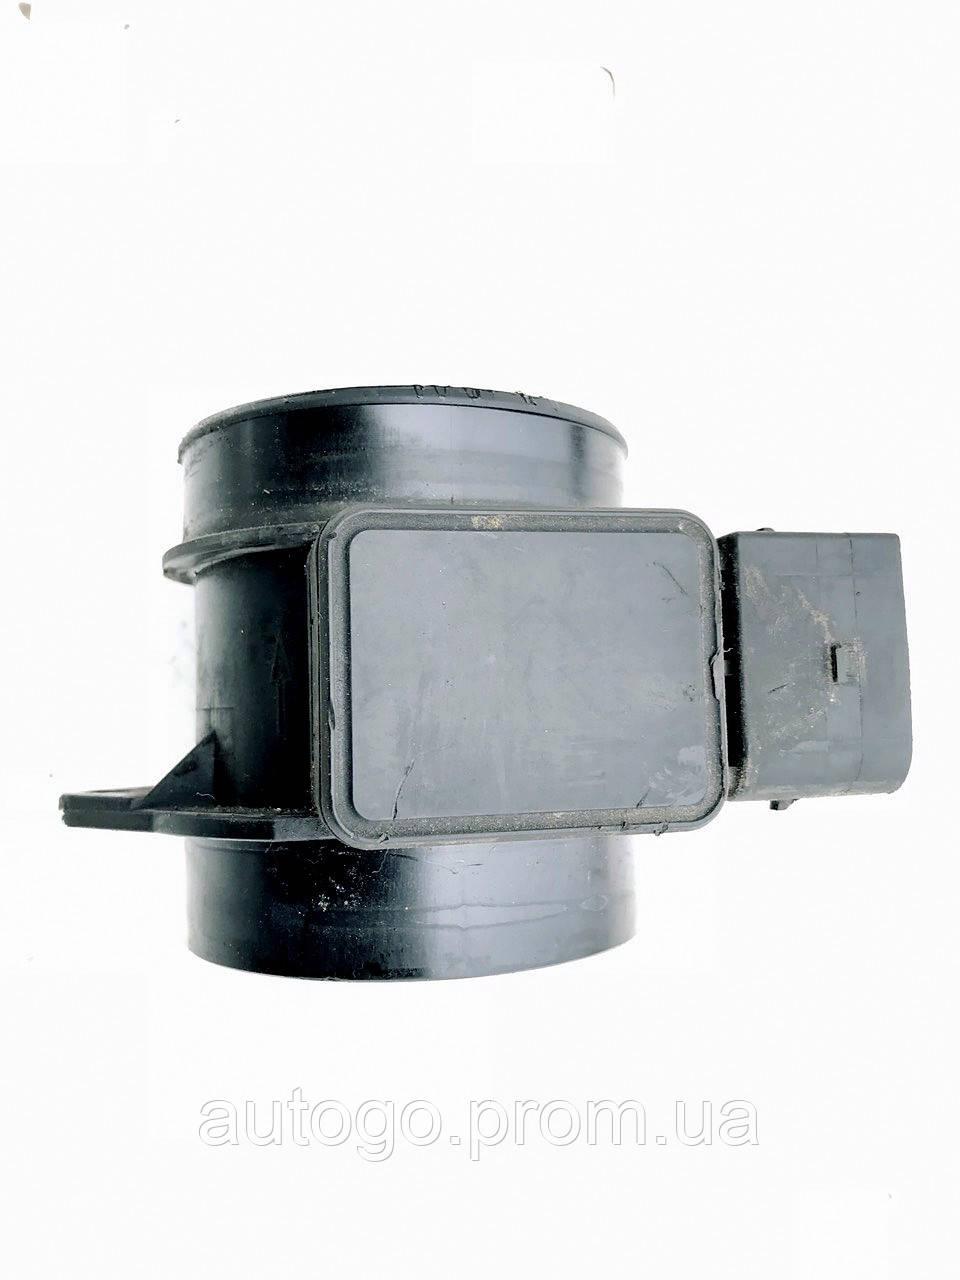 Датчик массового расхода воздуха Расходомер Kia Hyundai 28164-23700 , фото 1